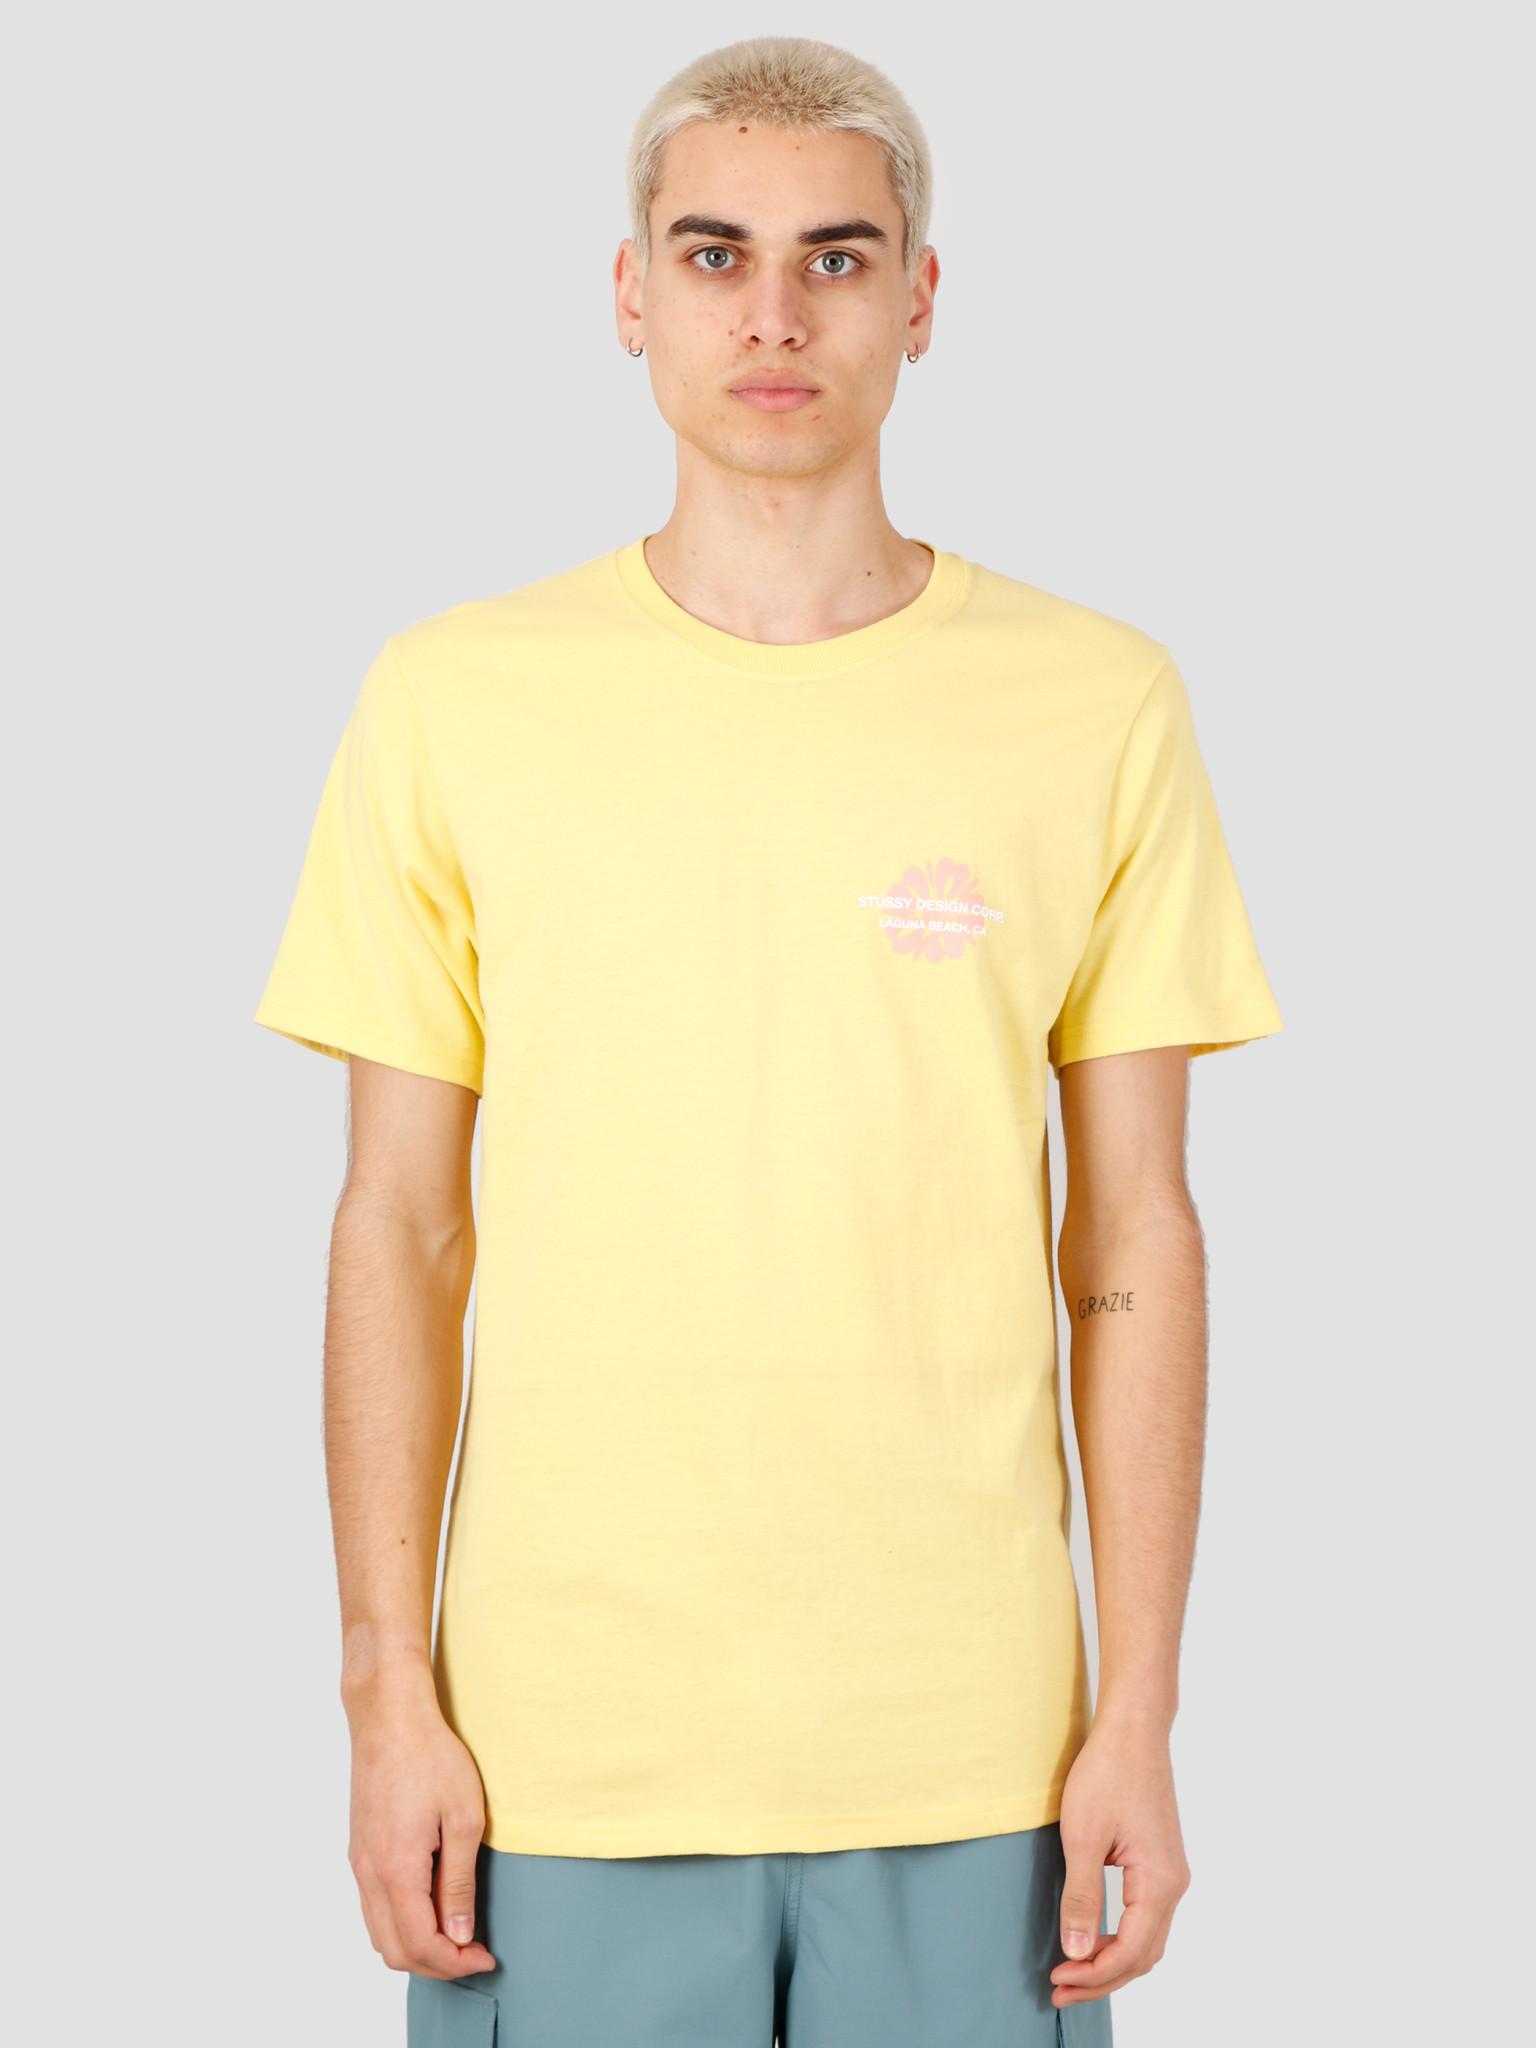 Stussy Stussy Laguna Flower Tee Yellow 1904508